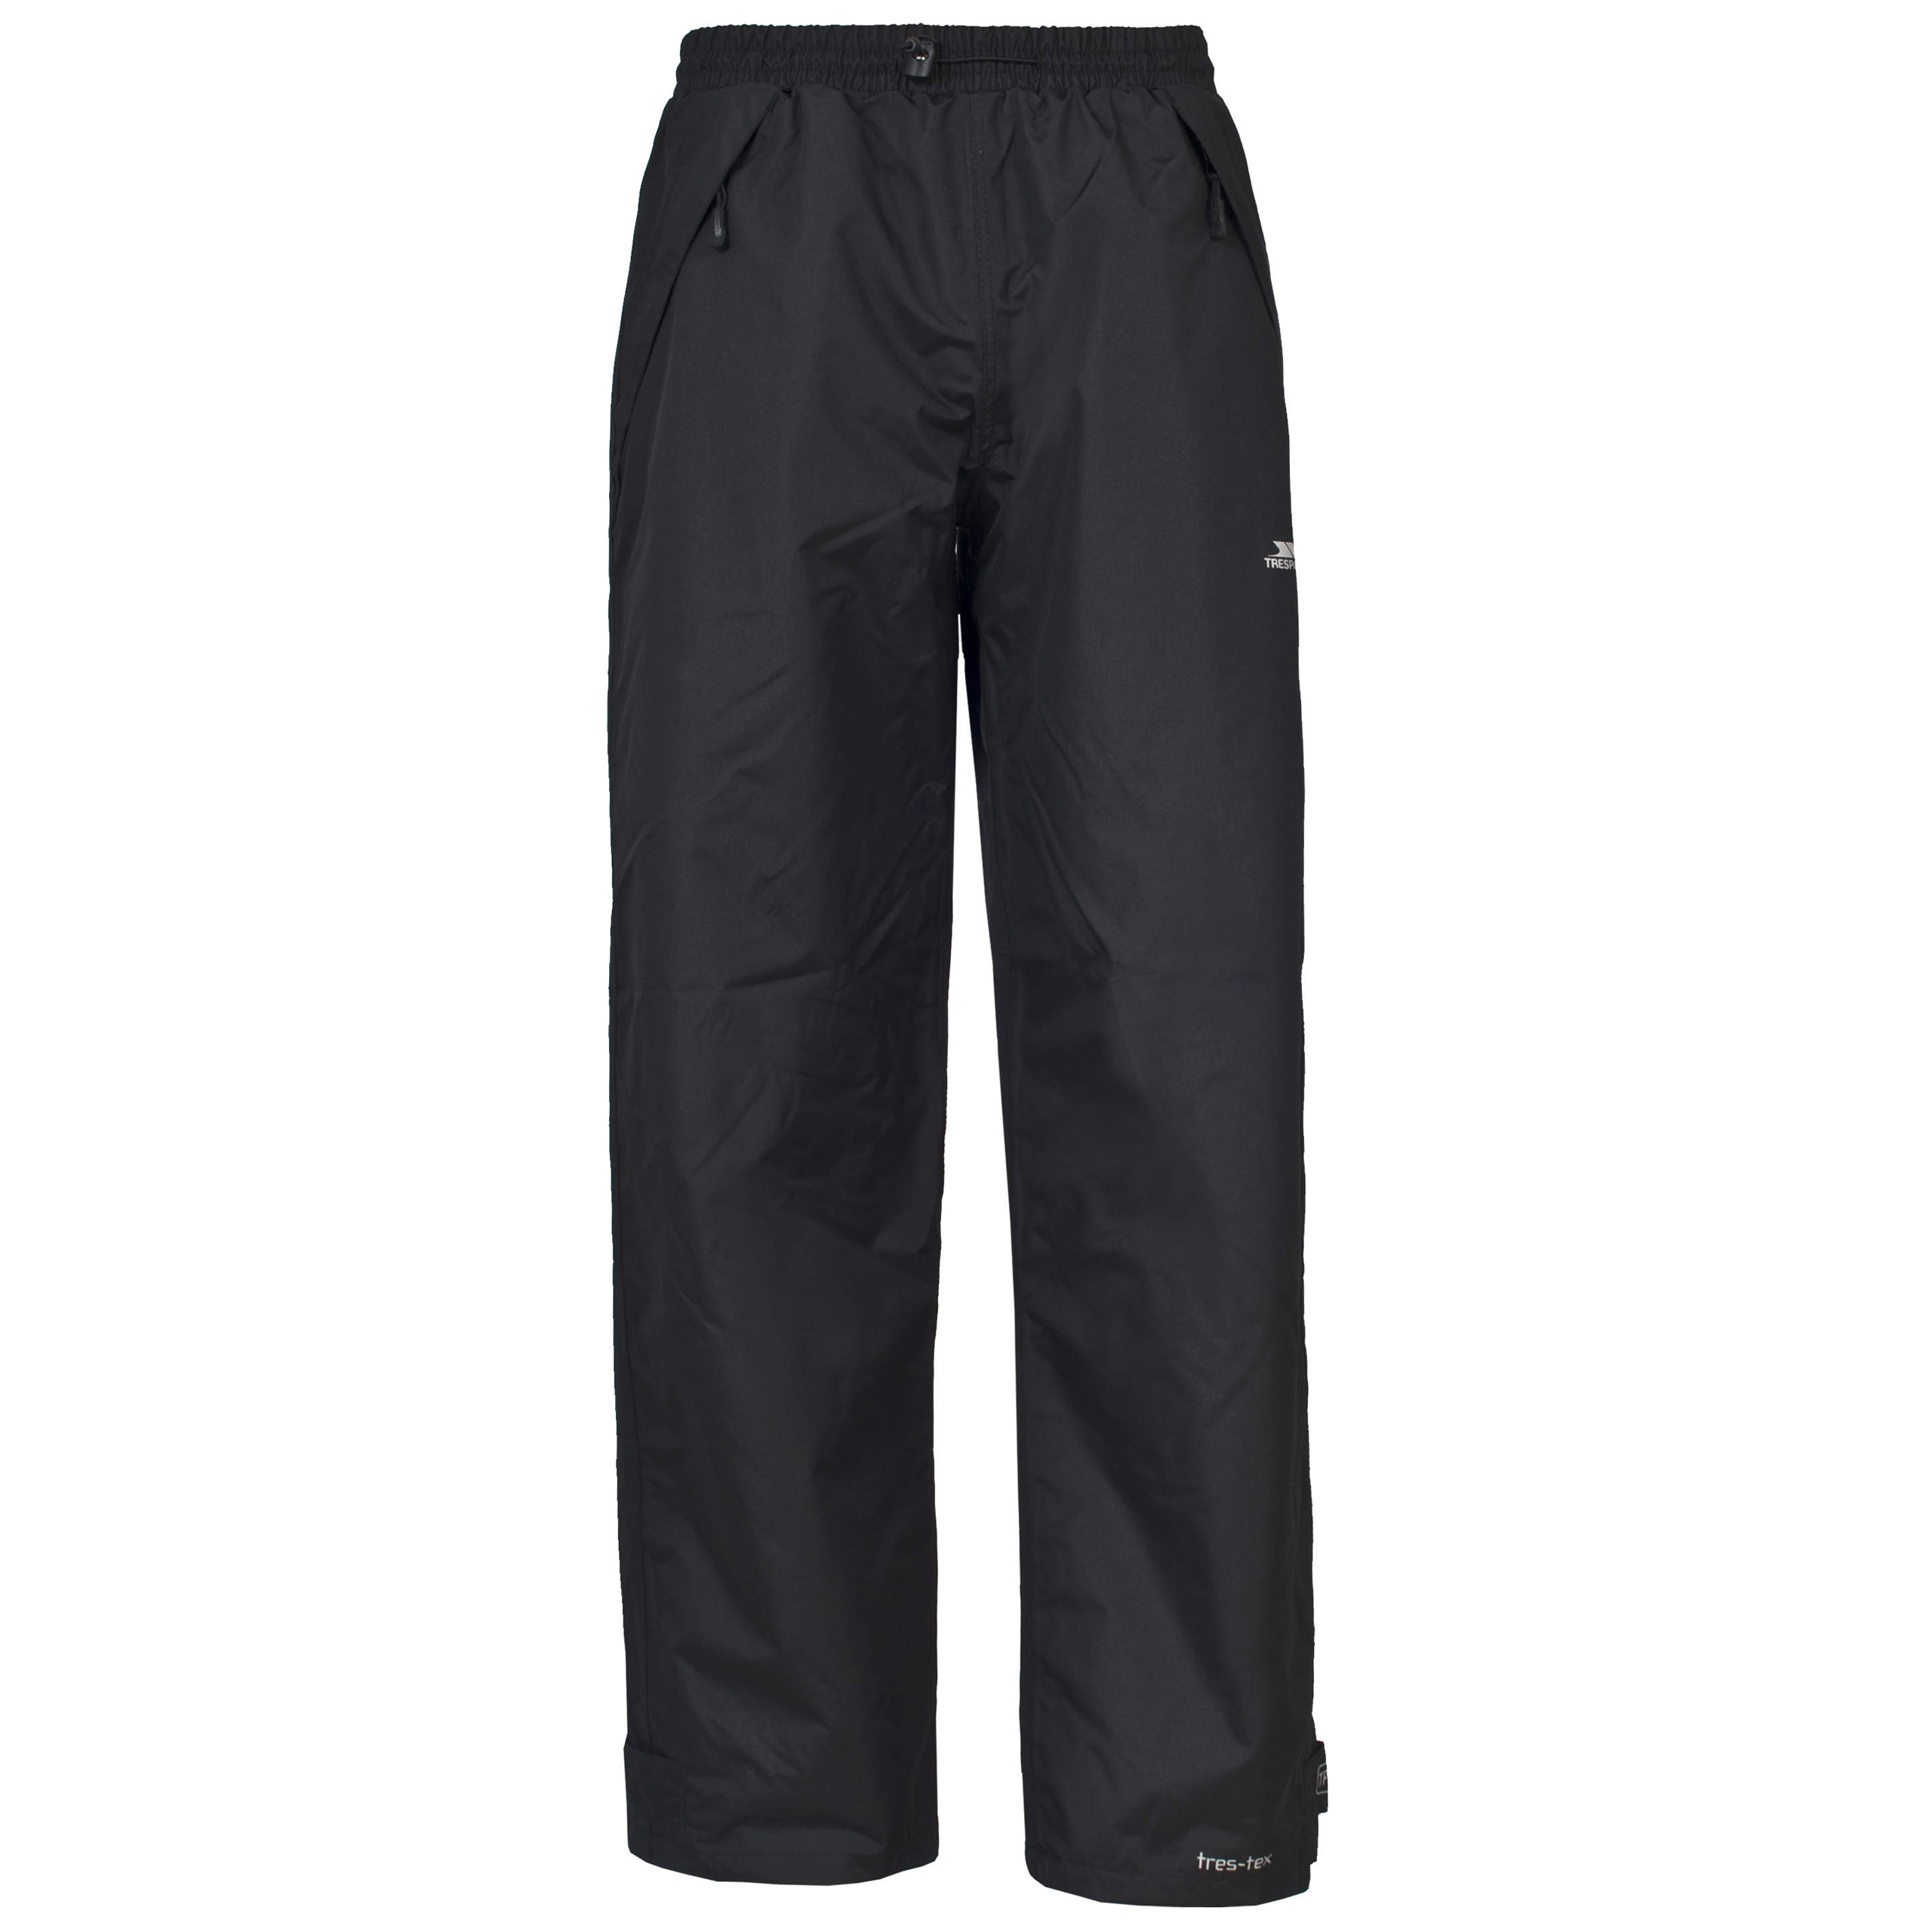 Trespass Womens Tutula Waterproof Trousers